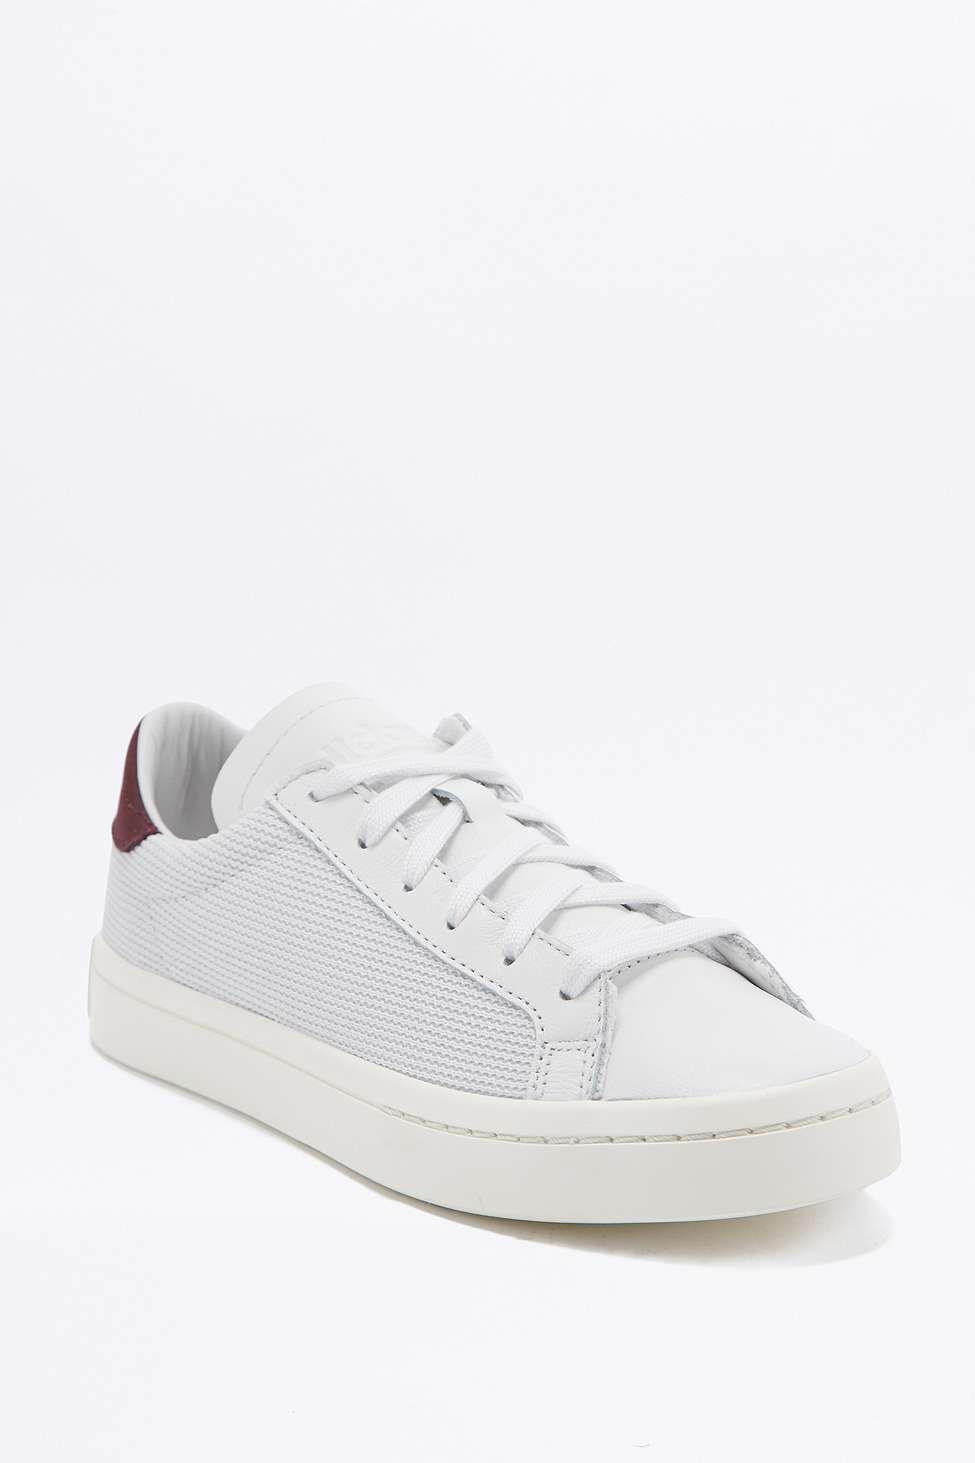 ebce4b4c220 adidas Originals Court Vantage White and Burgundy Trainers | shoes ...